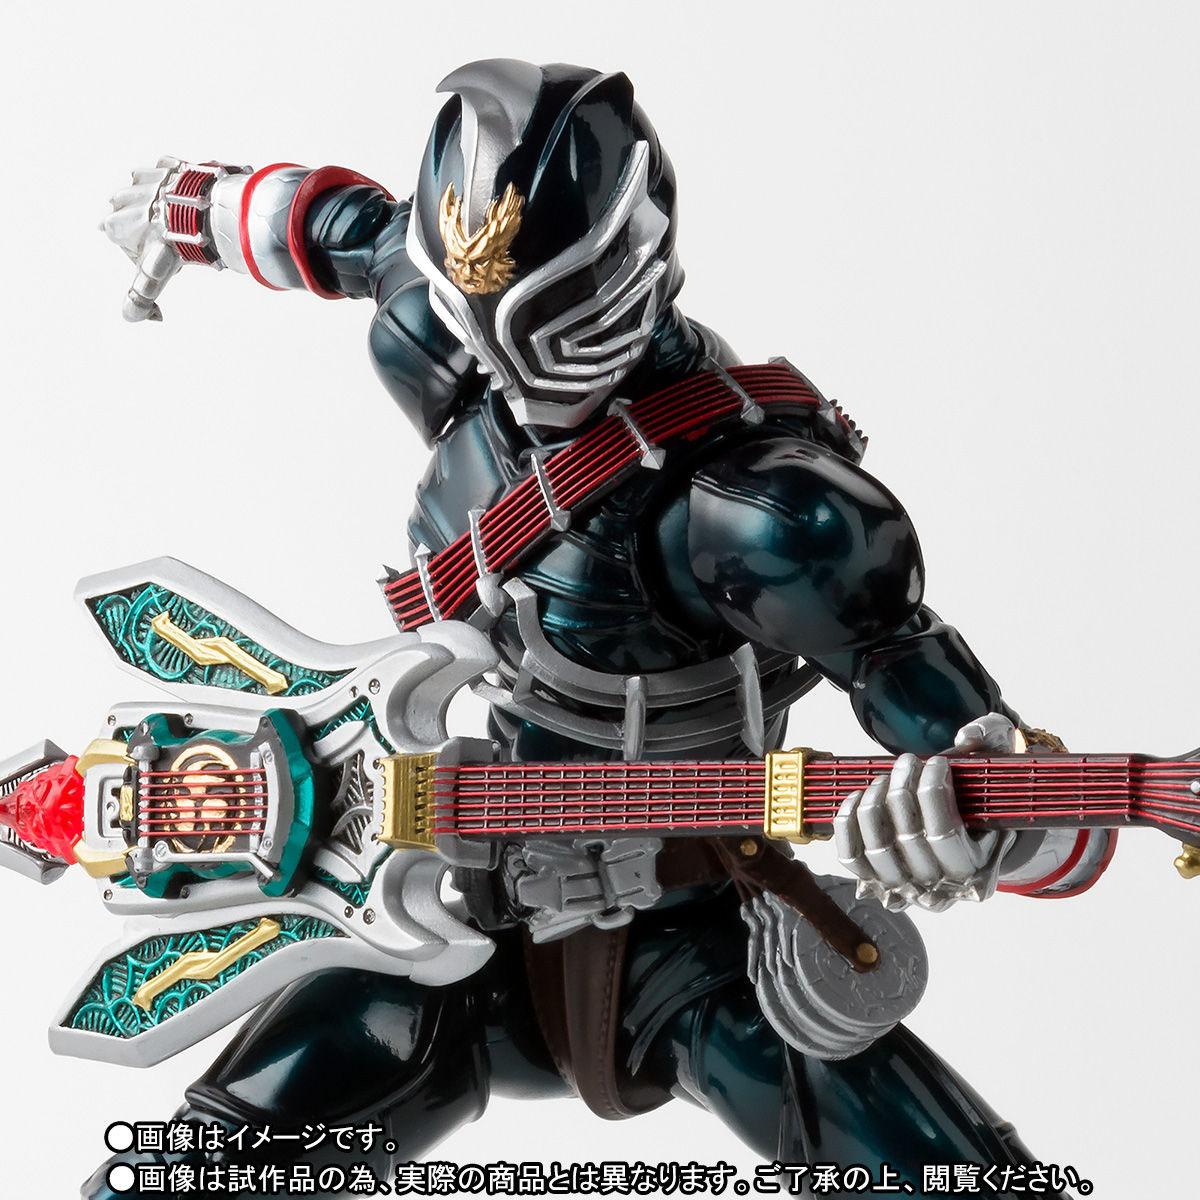 S.H.フィギュアーツ(真骨彫製法)『仮面ライダー轟鬼』可動フィギュア-001